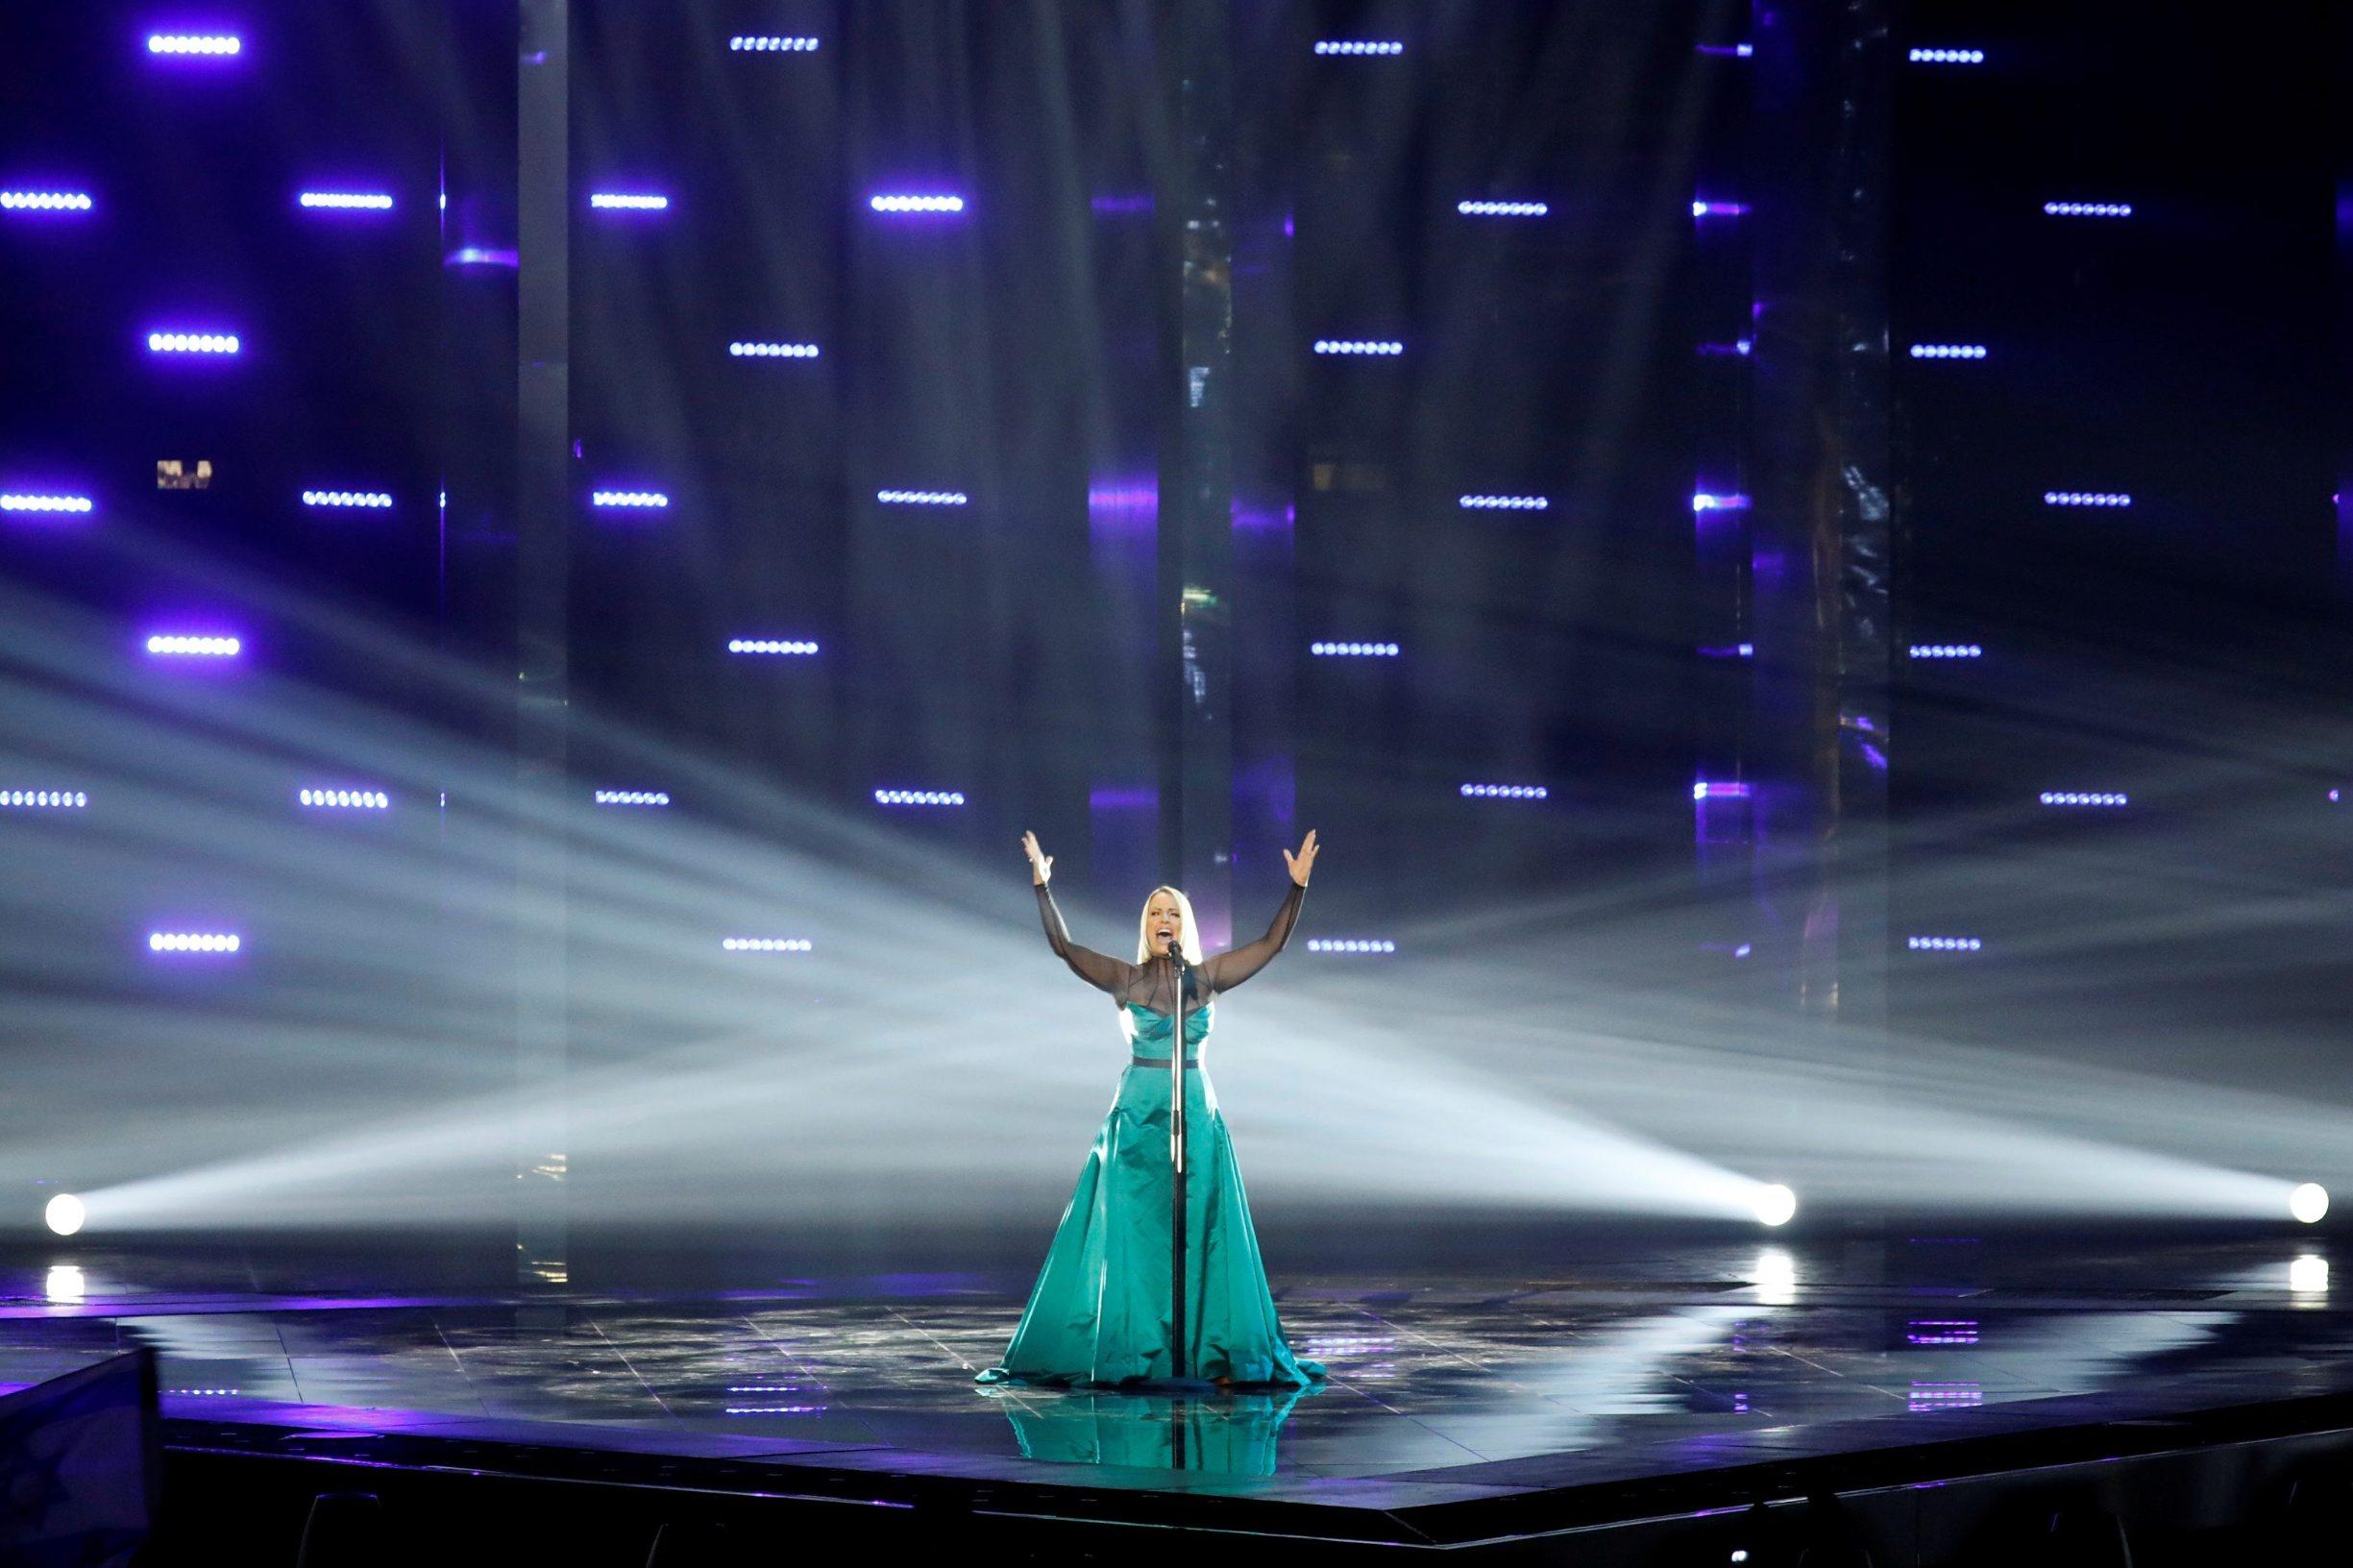 Participant Tamara Todevska of North Macedonia performs during second semi-final of 2019 Eurovision Song Contest in Tel Aviv, Israel May 16, 2019. REUTERS/ Amir Cohen